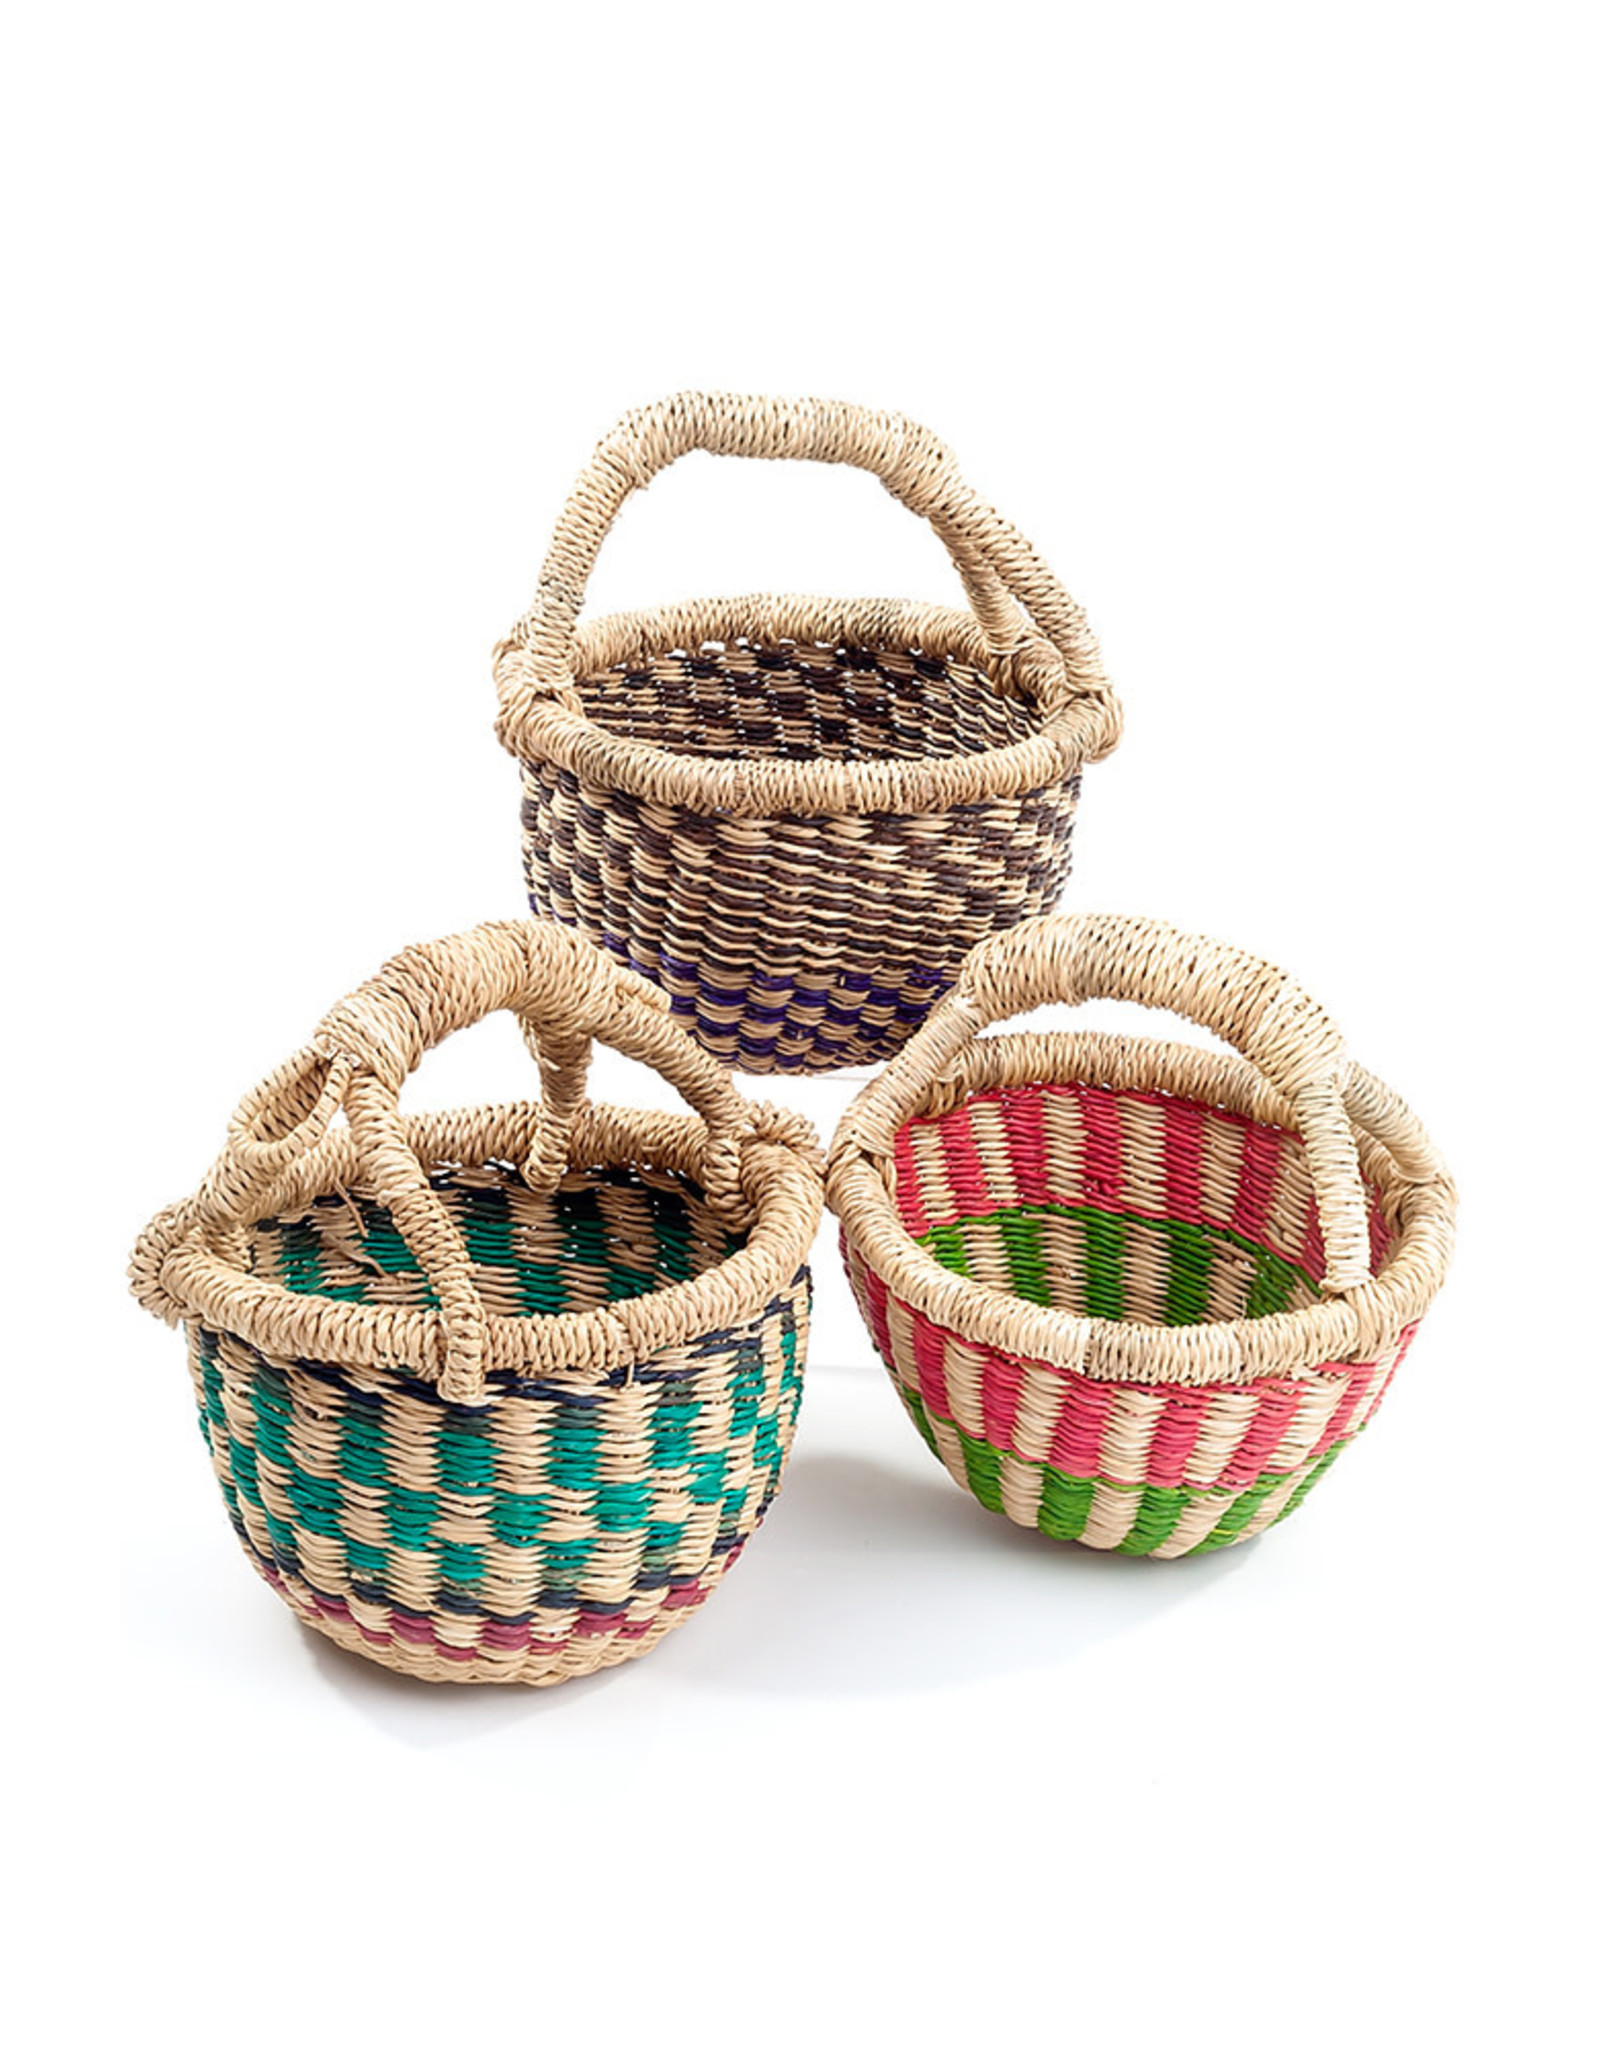 Swahili Wholesale Teeny Bolga Basket, Assorted, Ghana